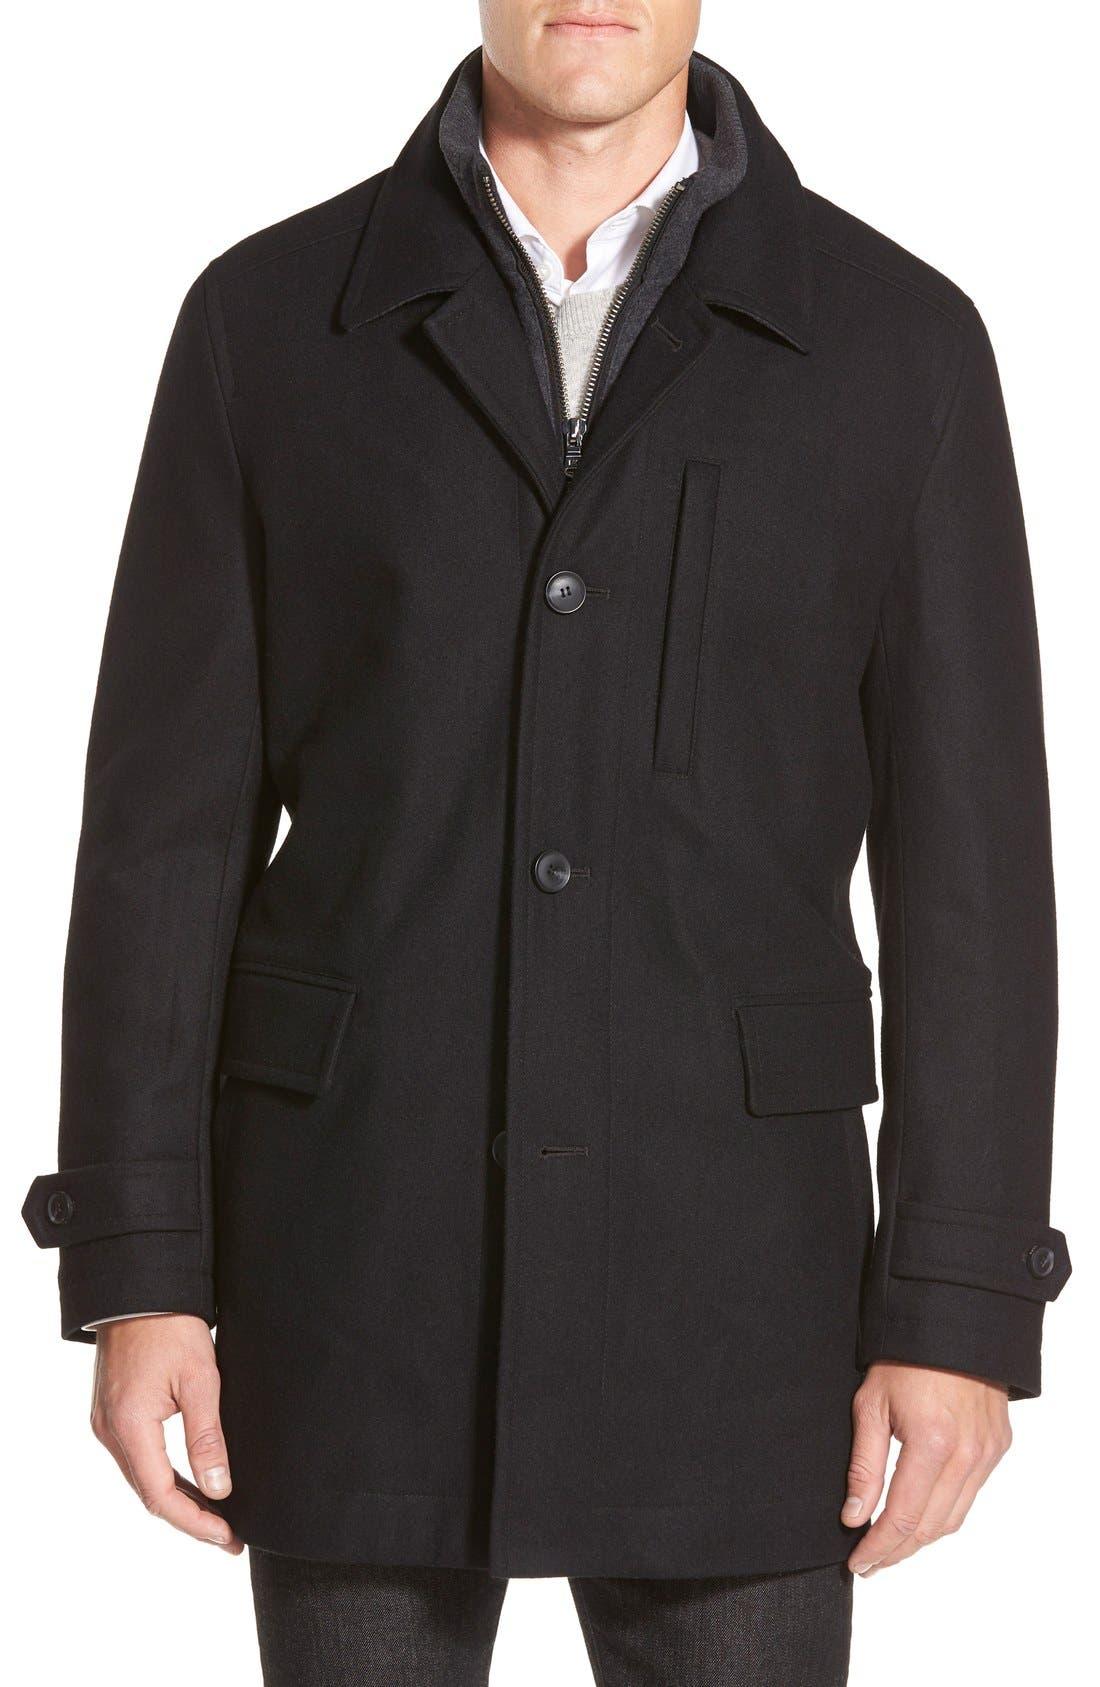 MICHAEL KORS Car Coat, Main, color, 001